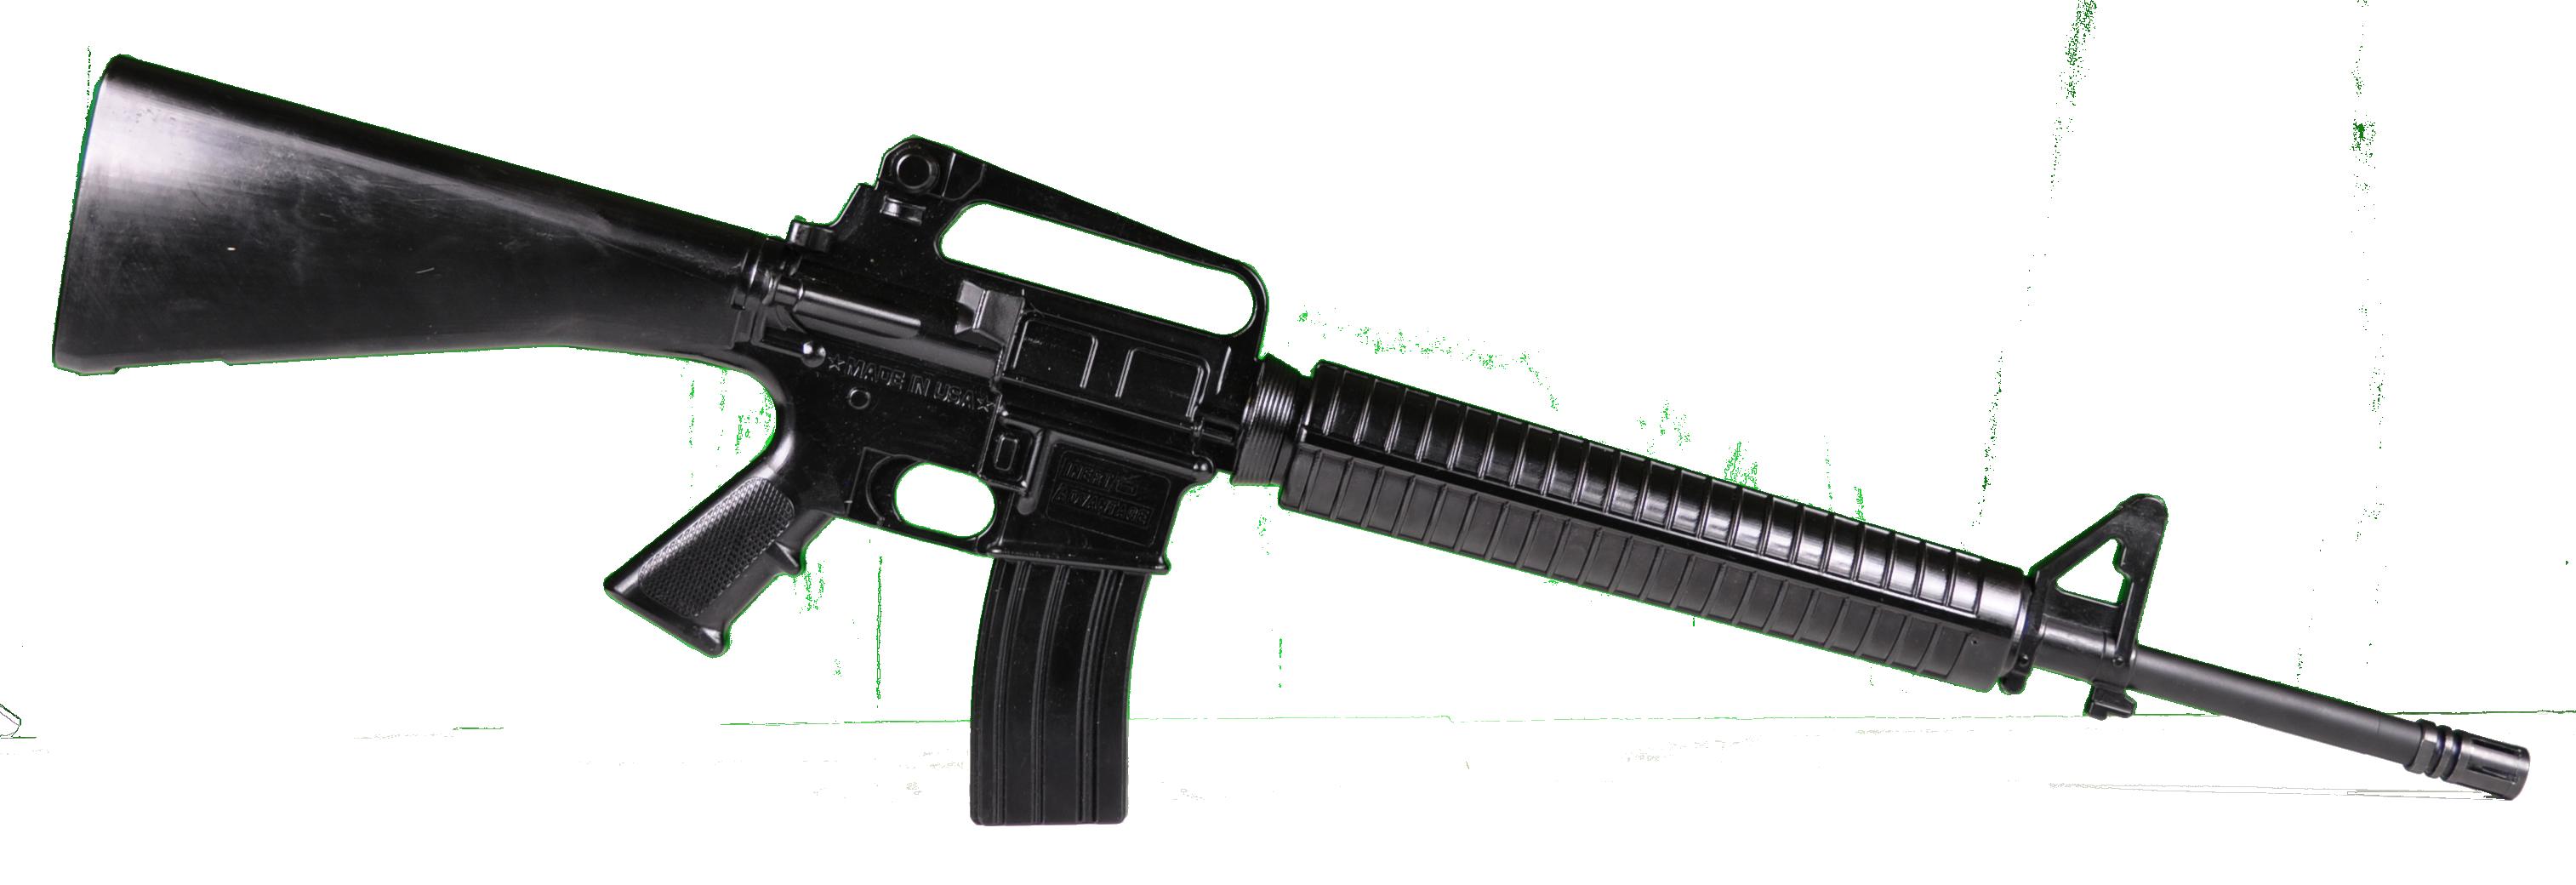 Black png image purepng. Clipart gun assault rifle